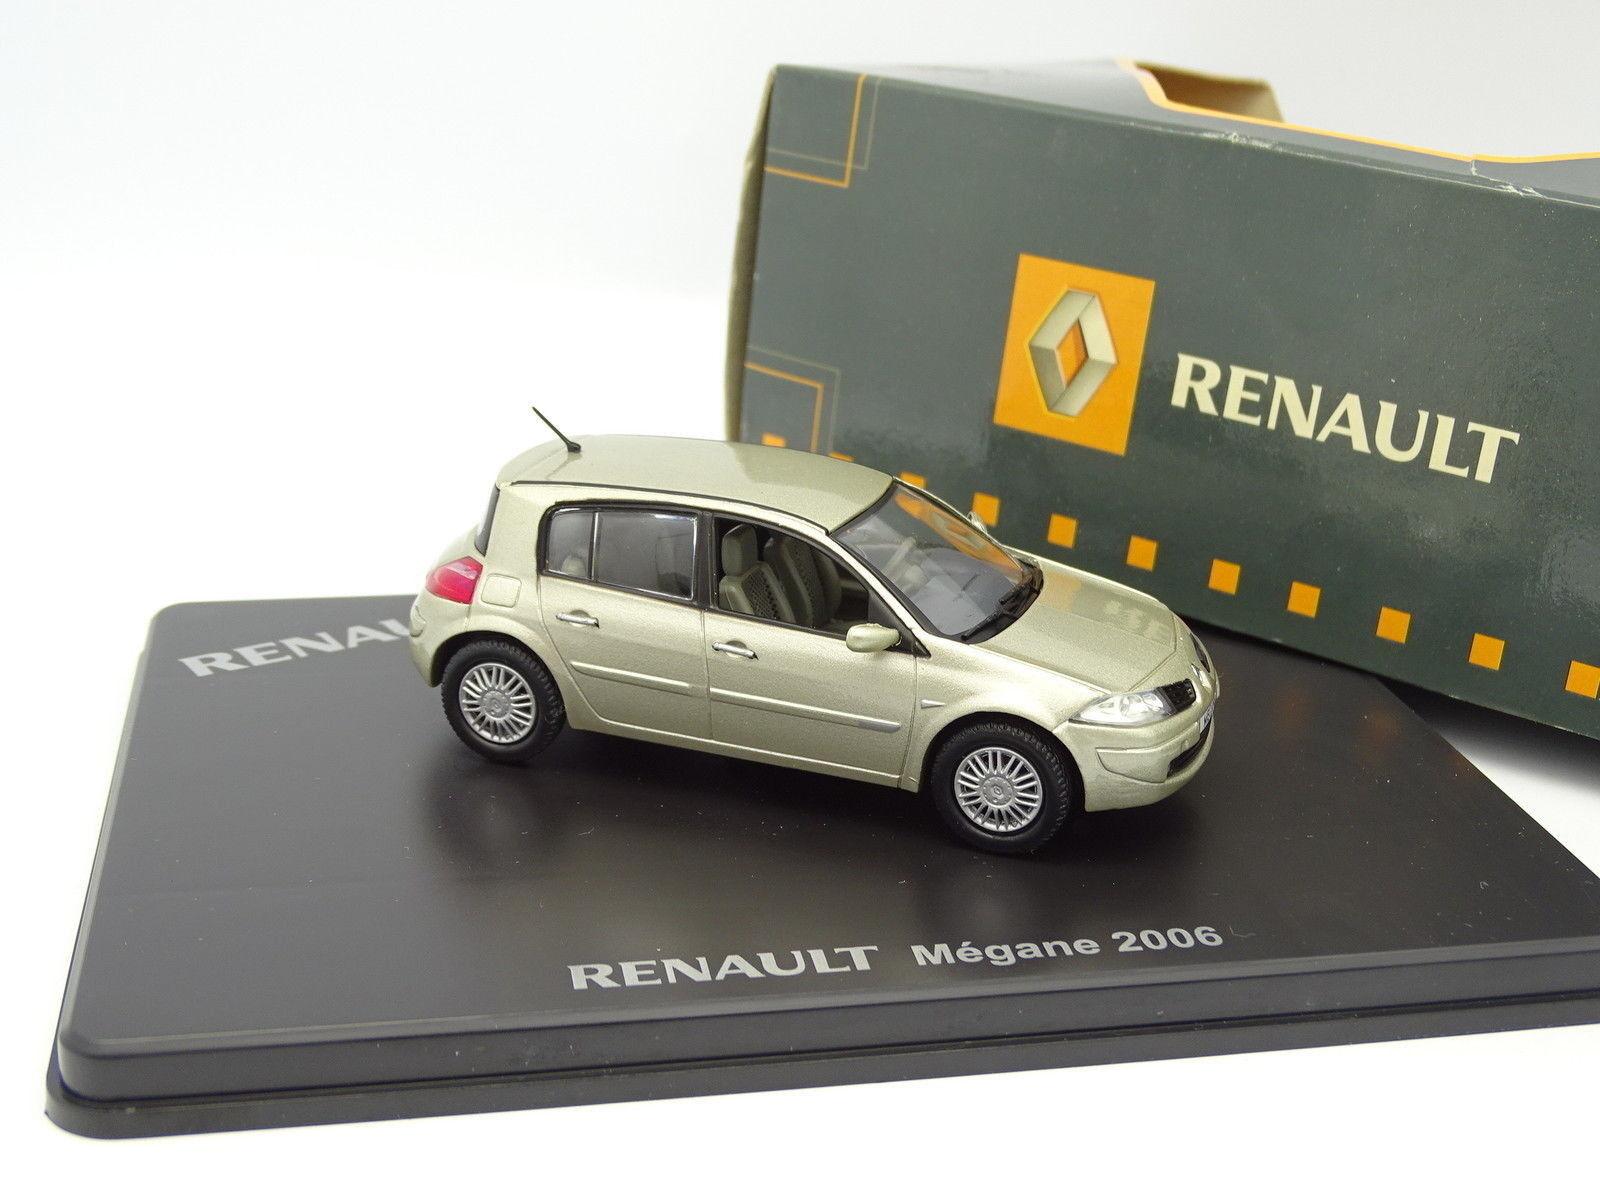 Eligor 1 43 - Renault Megane 2006 Beige Metall